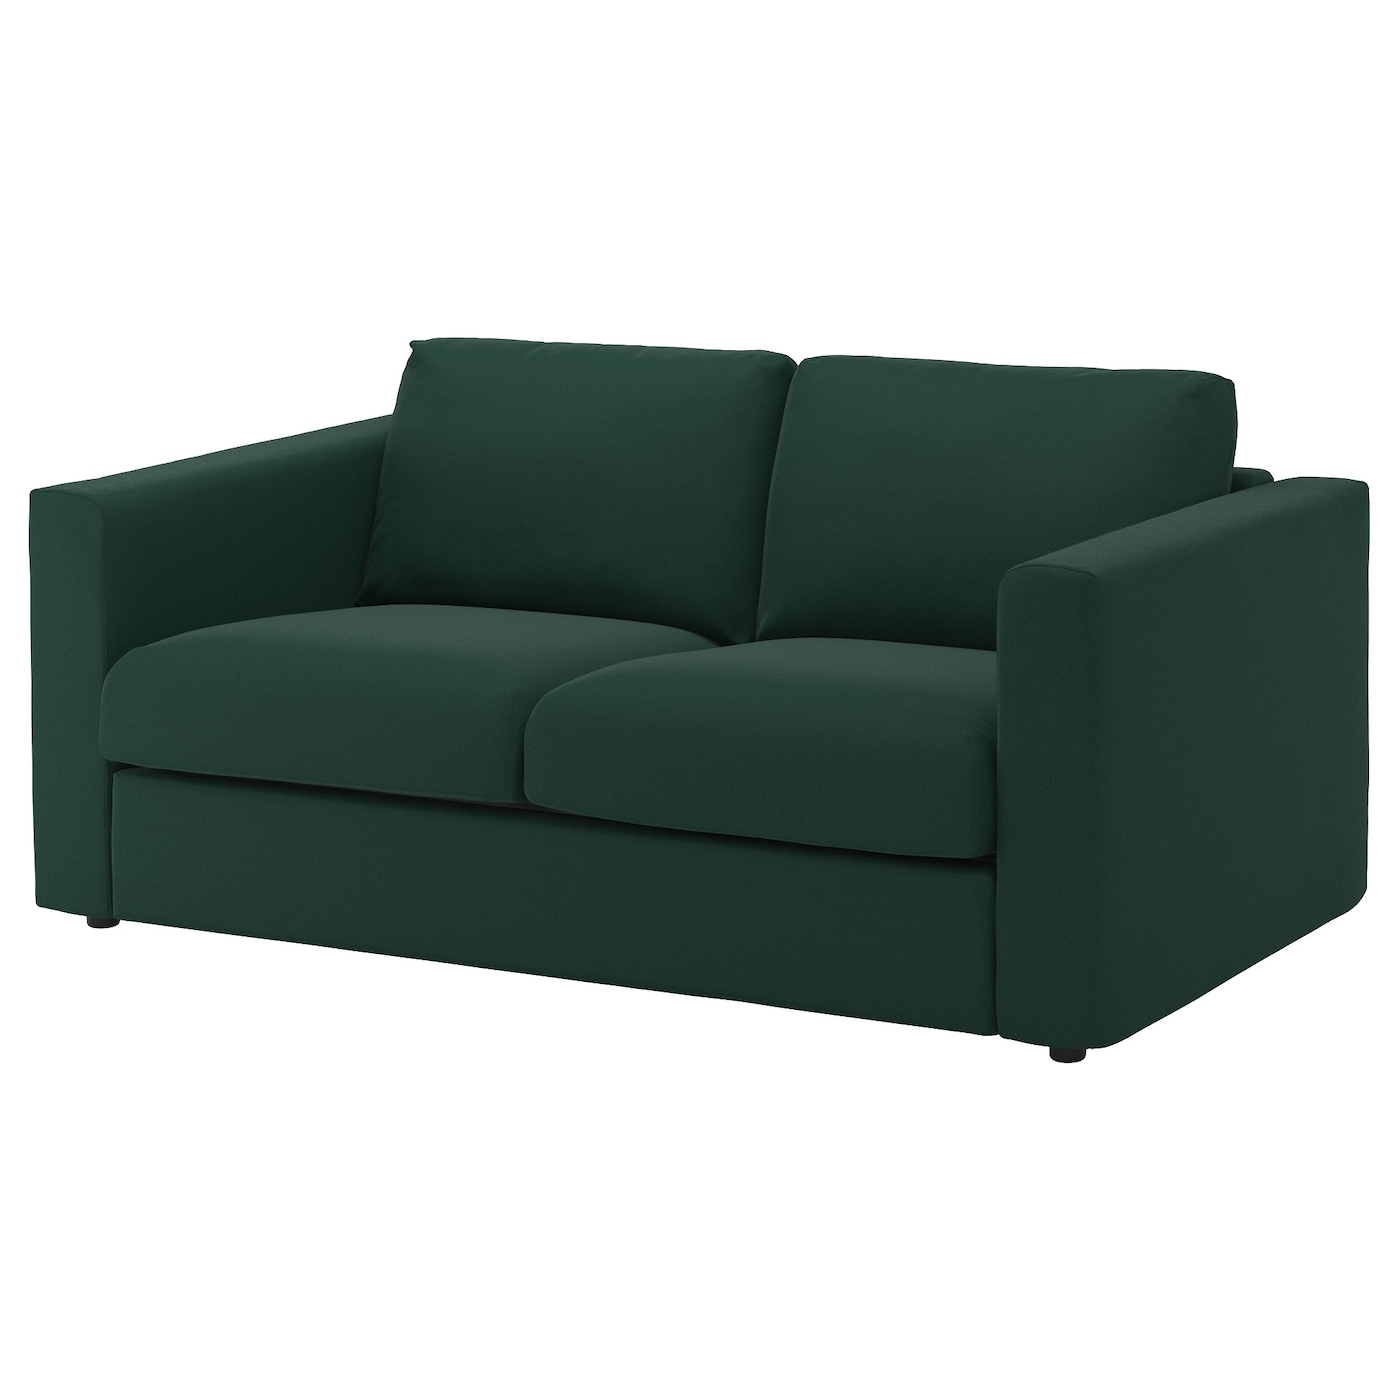 Vimle Cover For 2 Seat Sofa Gunnared Dark Green Ikea